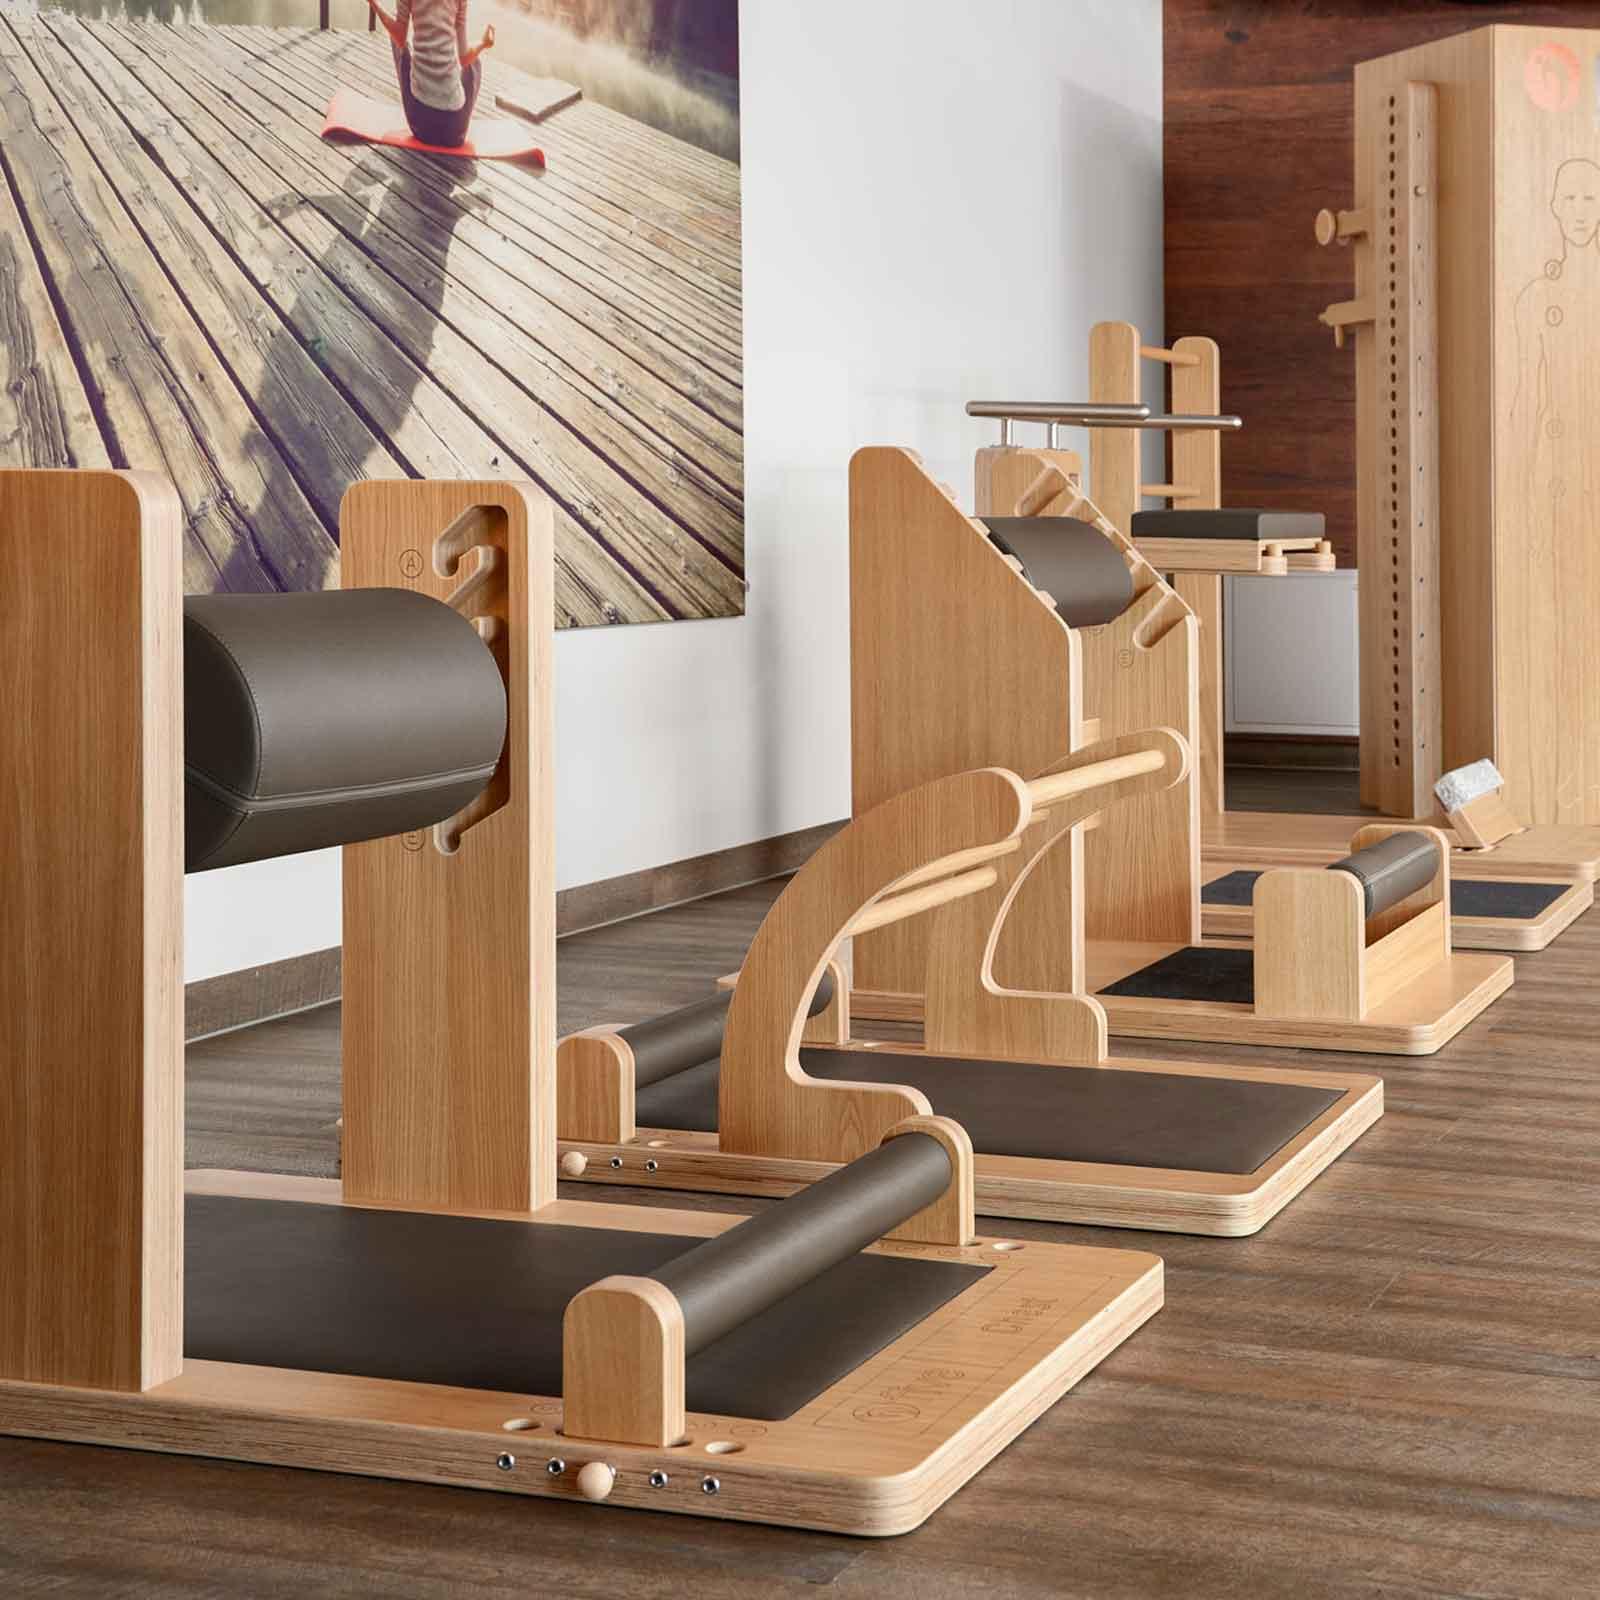 Frick Five Fitness Geräte